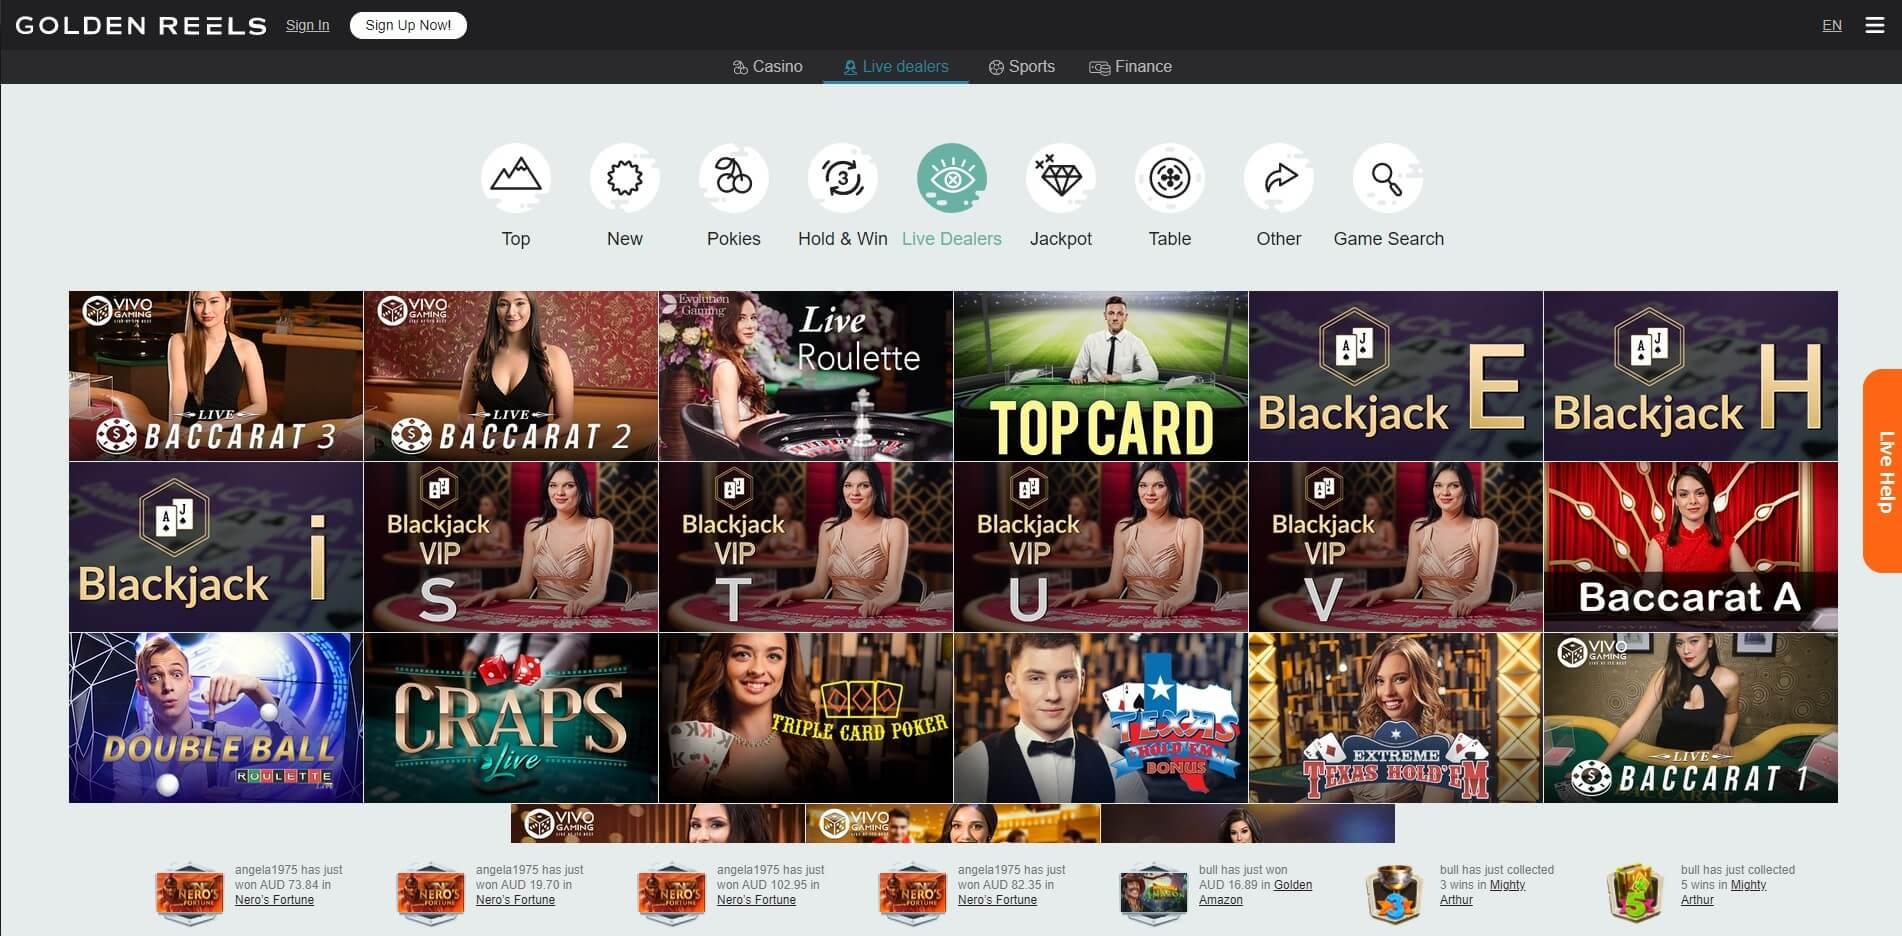 Golden Reels Casino Live Games Screenshot